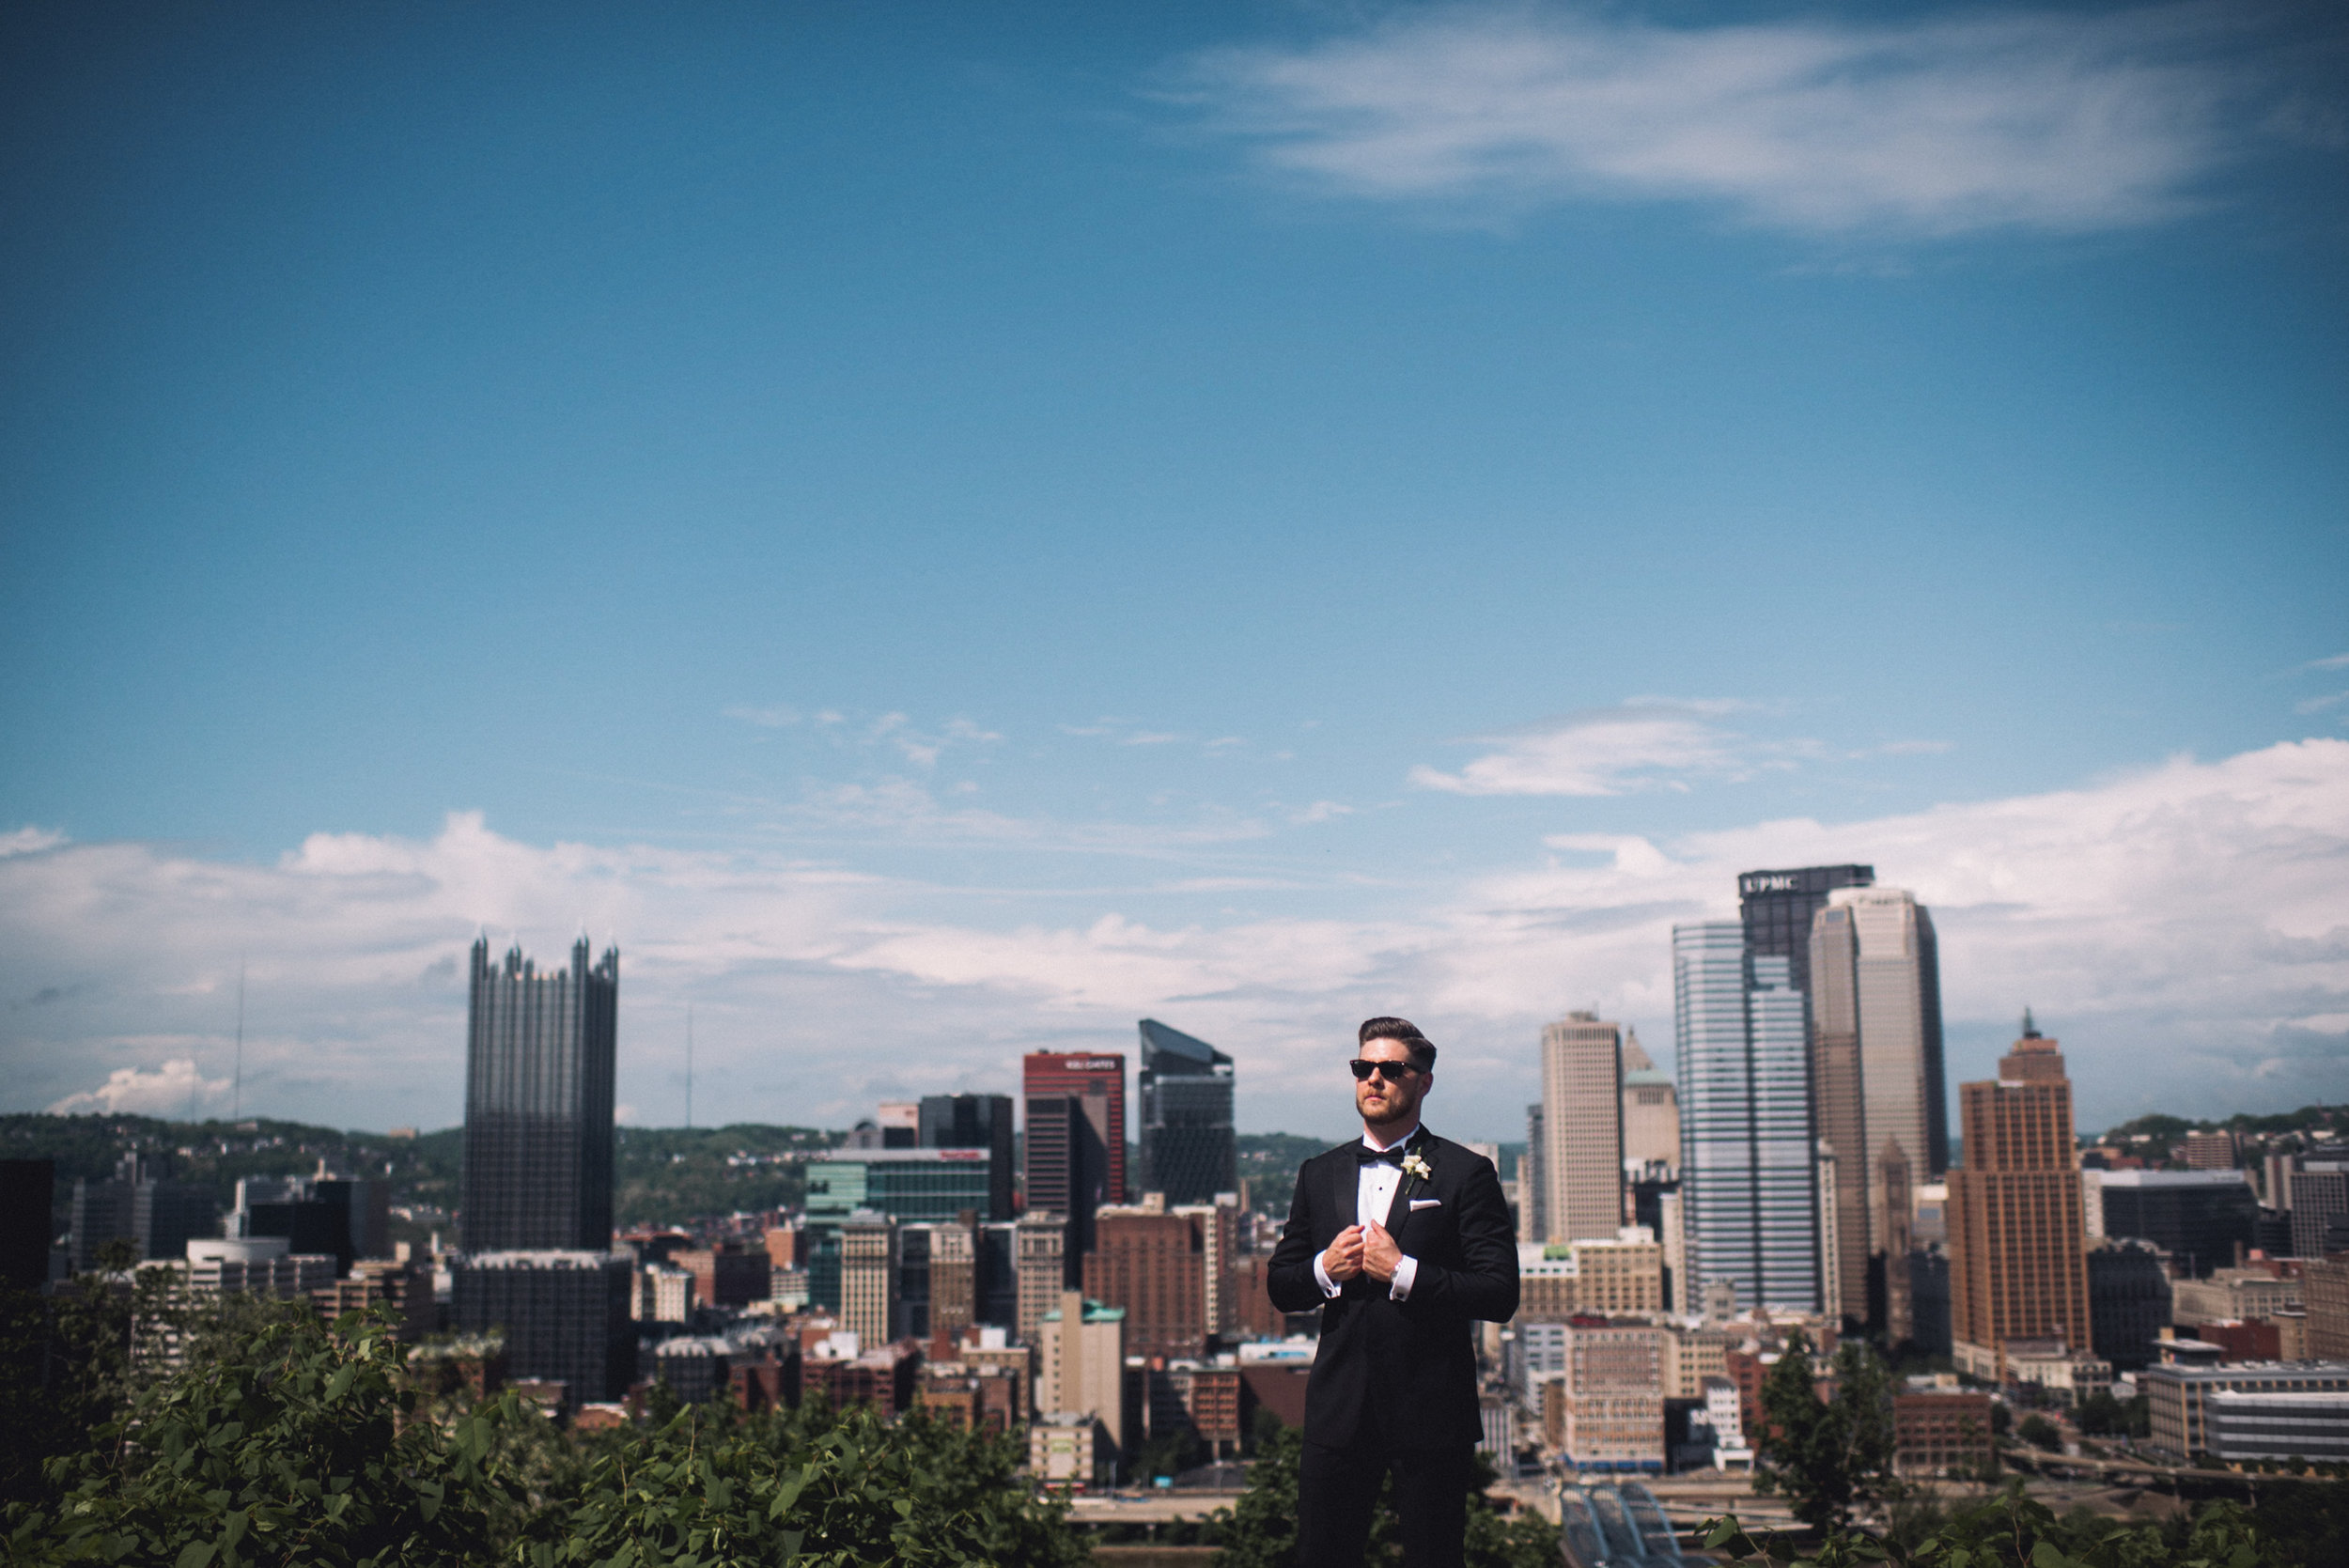 Pittsburgh Pennsylvania New York NYC Wedding Photographer Photojournalist Luxury Downtown Opera - Stirpe 986.jpg